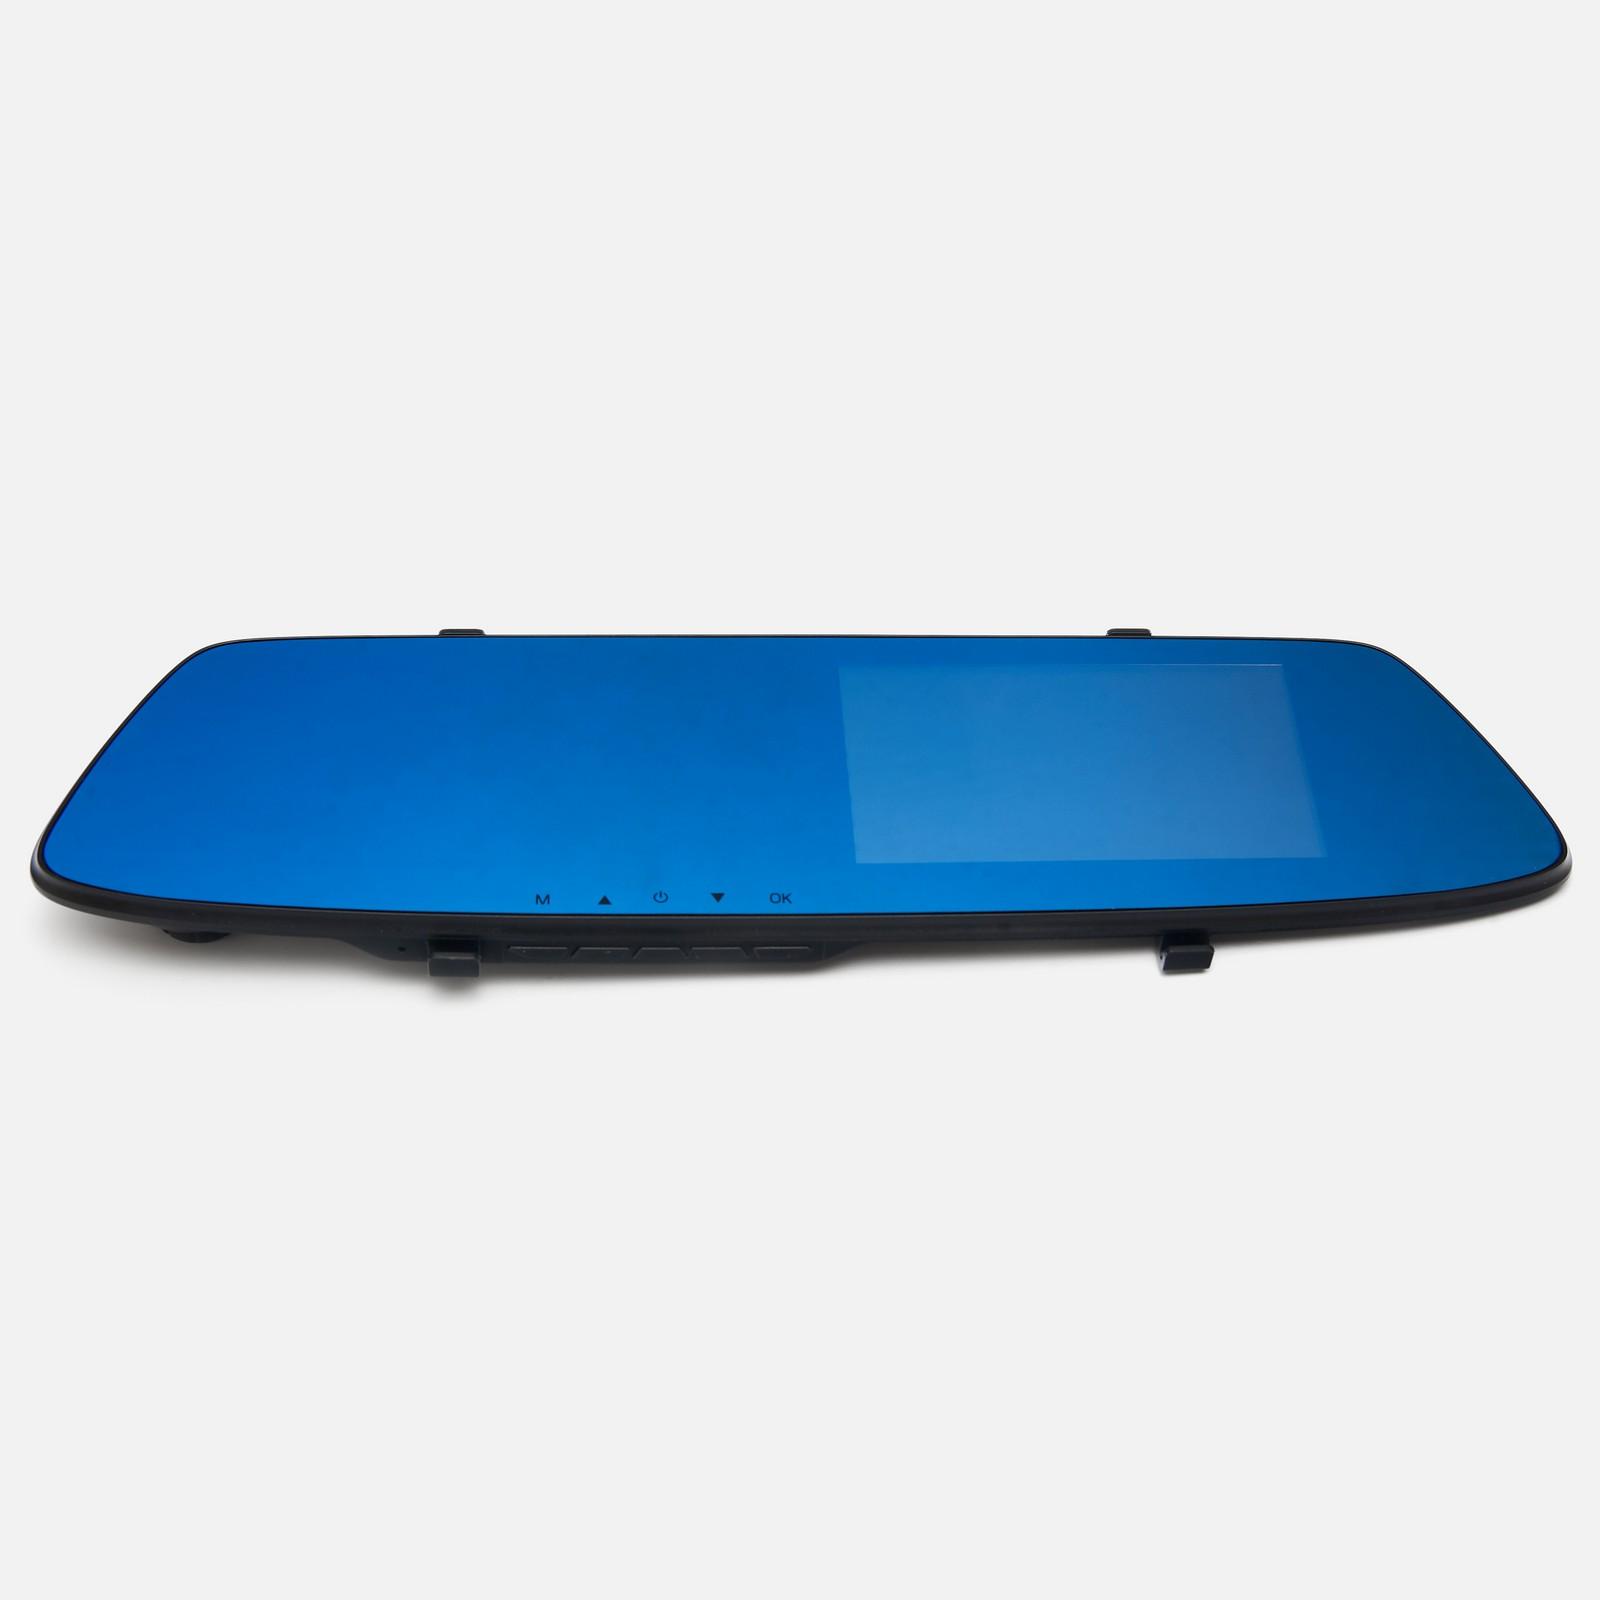 Видеорегистратор зеркало заднего вида Vehicle BlackBox Full HD, 2 камеры, версия 2.0